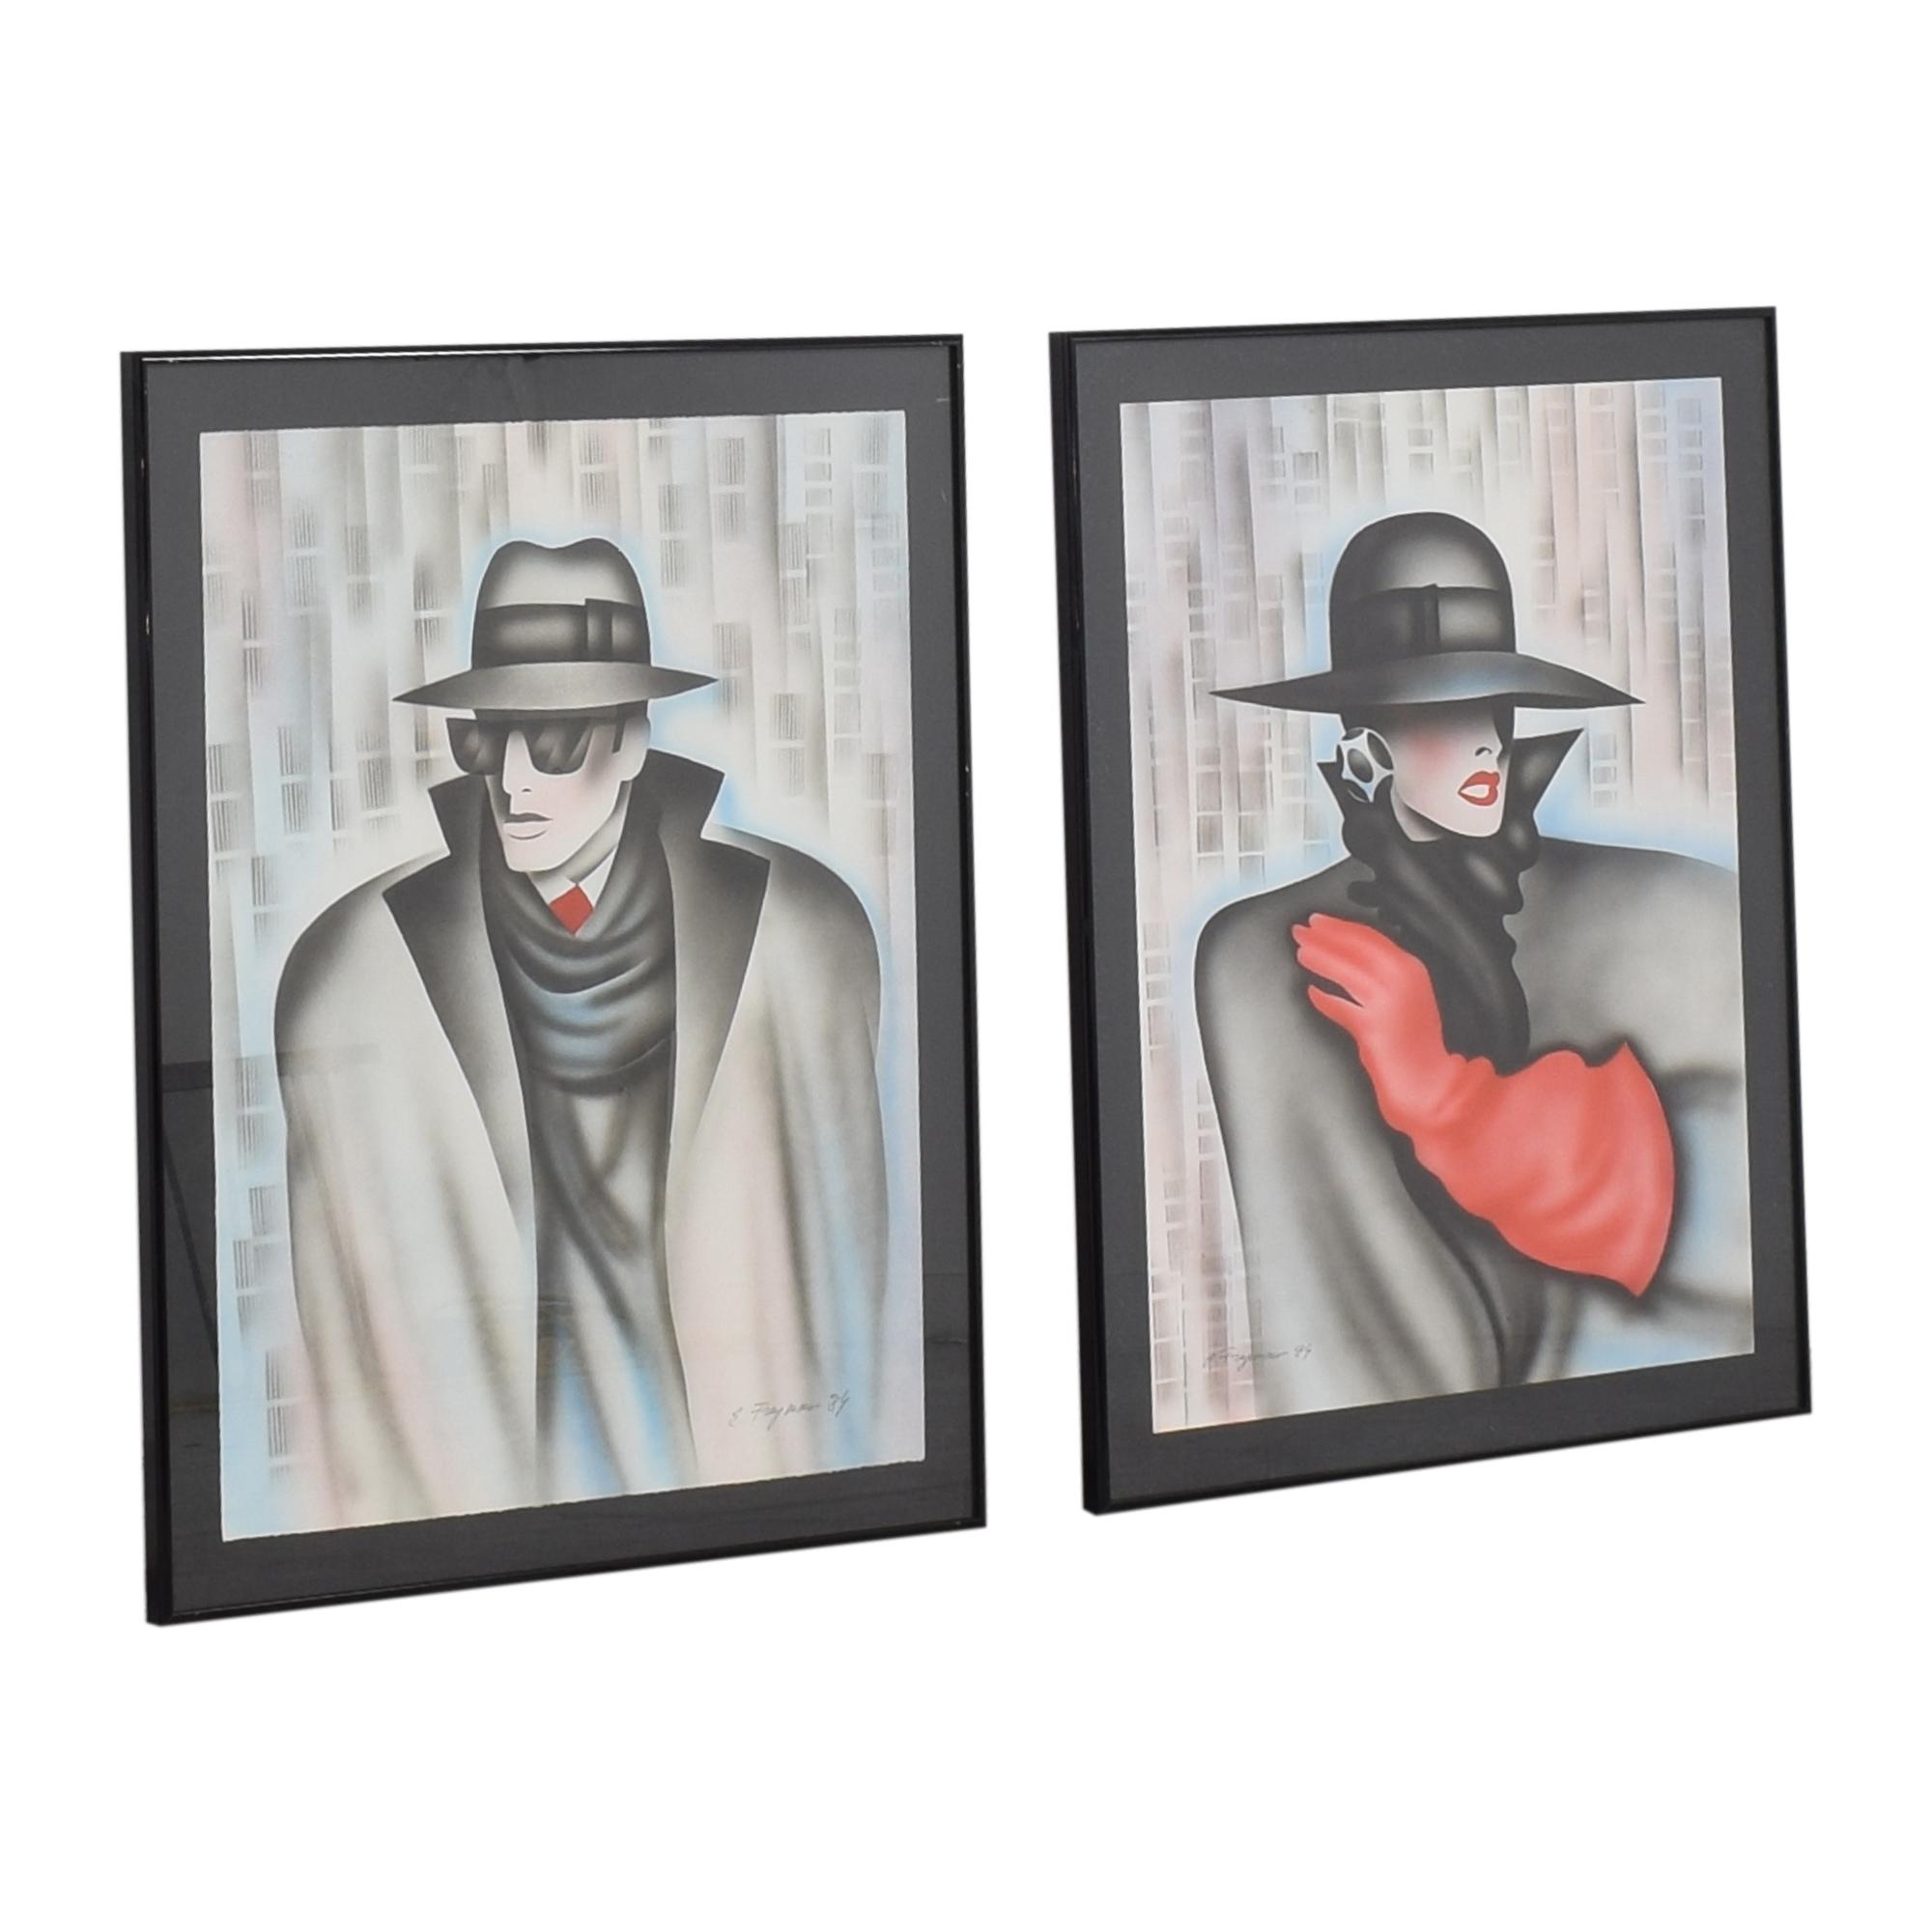 Framed Erik Freyman Wall Art pa